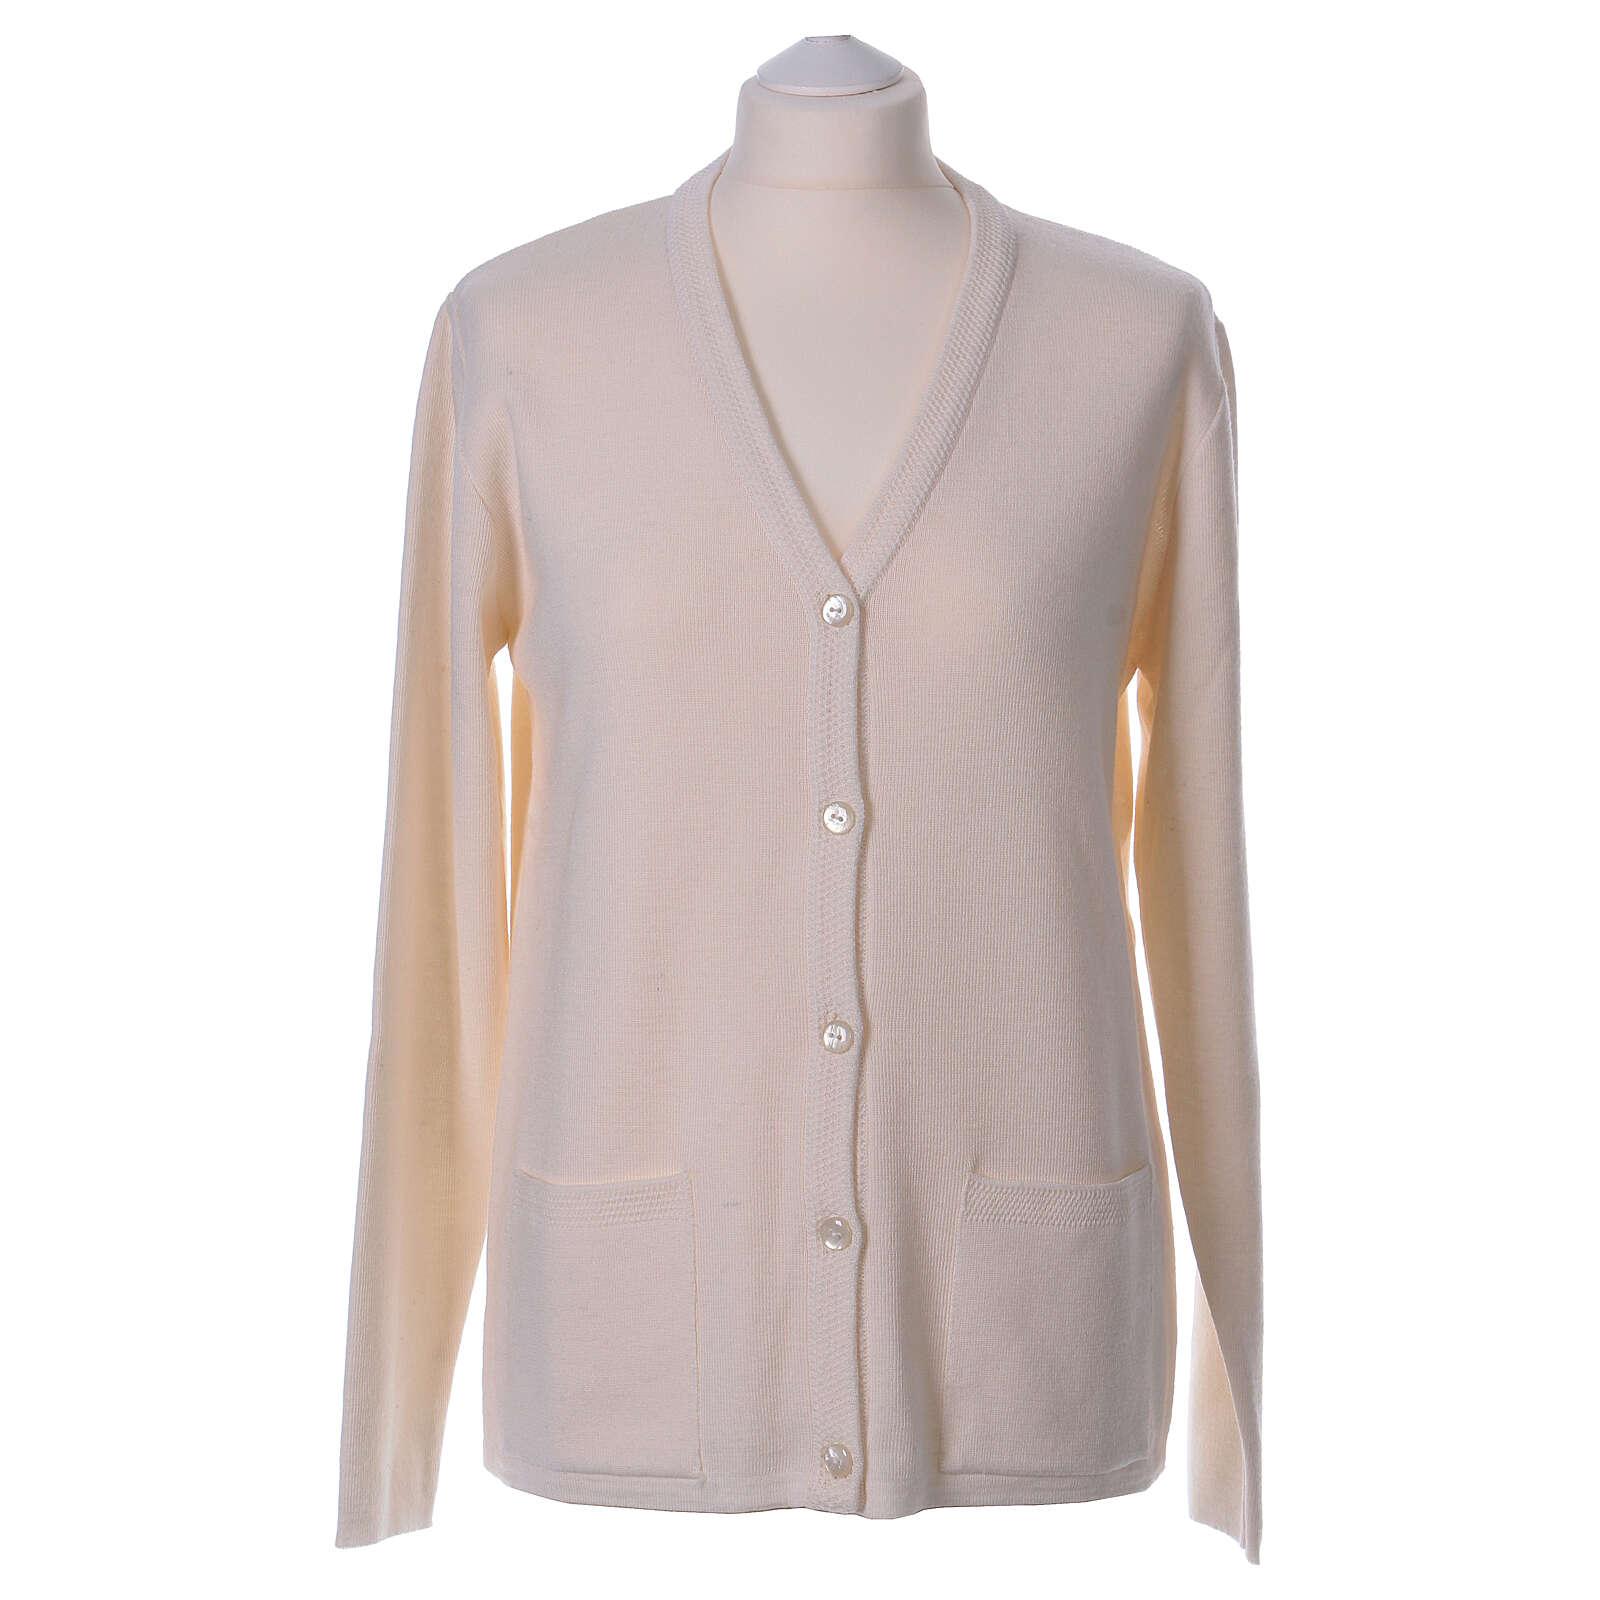 Rebeca monja blanco cuello V bolsillos punto unido 50% acrílico 50% lana merina In Primis 4